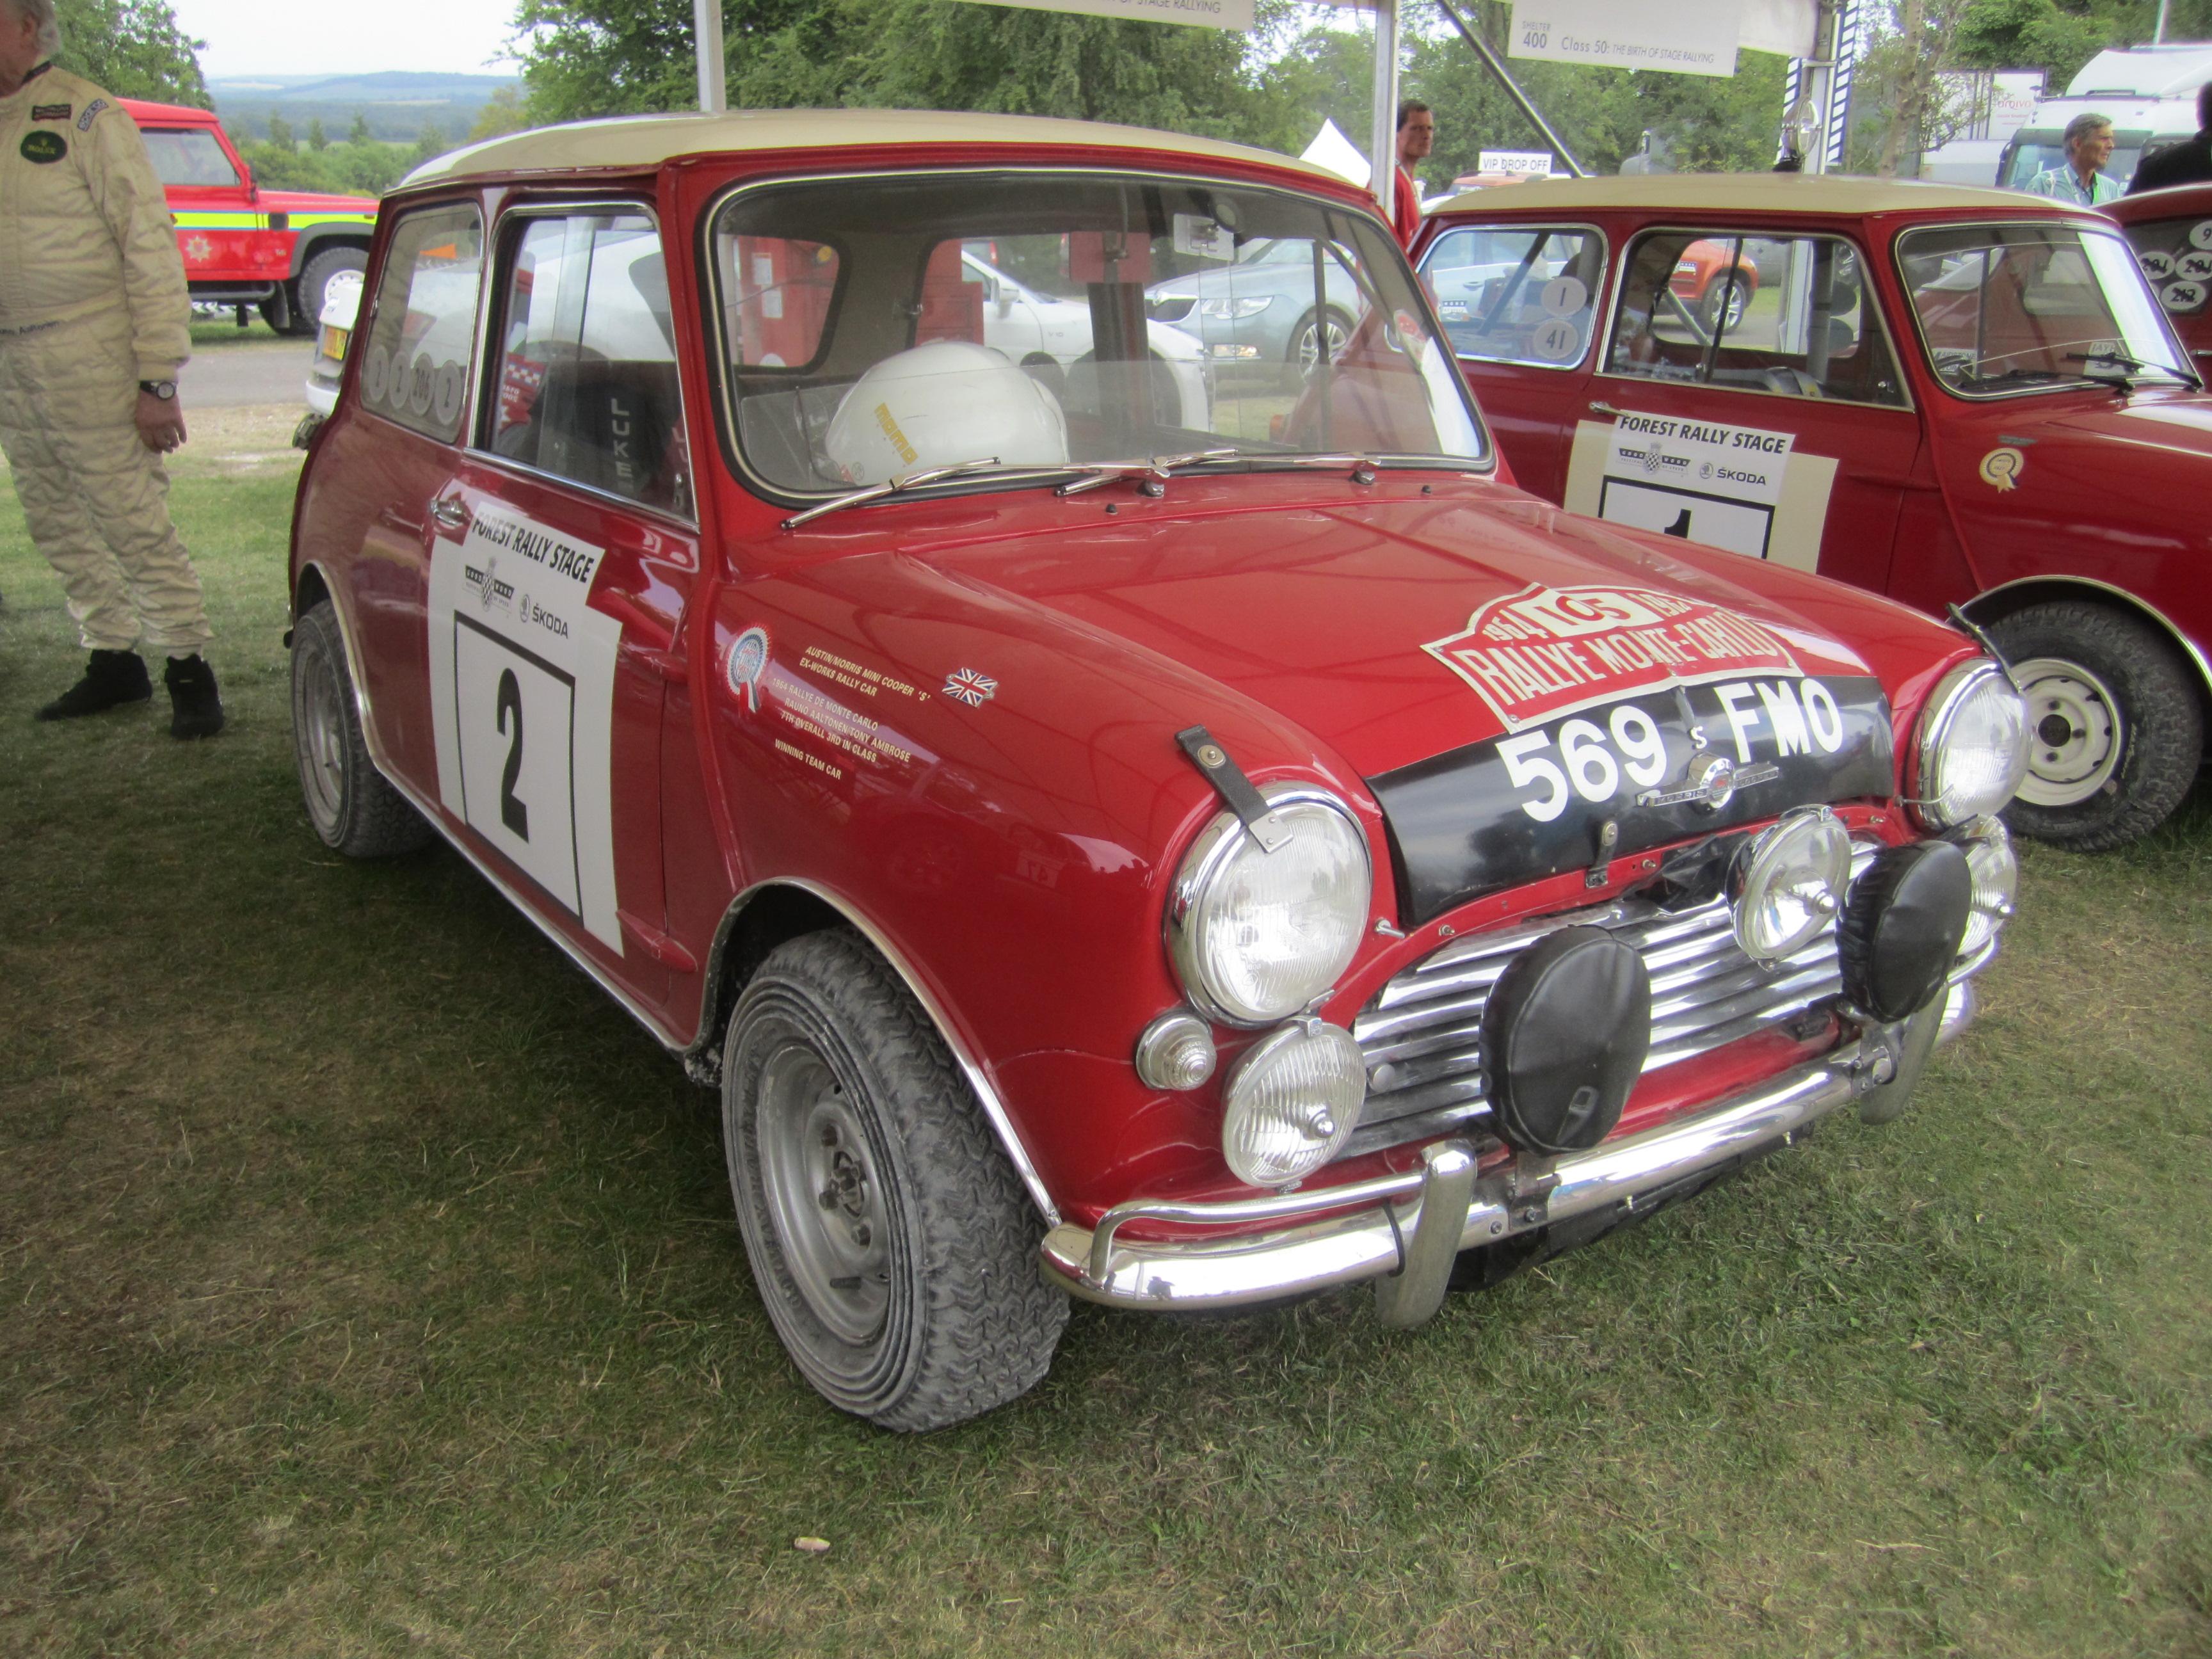 File:Morris Mini Cooper S 1963 Rally Car.jpg - Wikimedia Commons